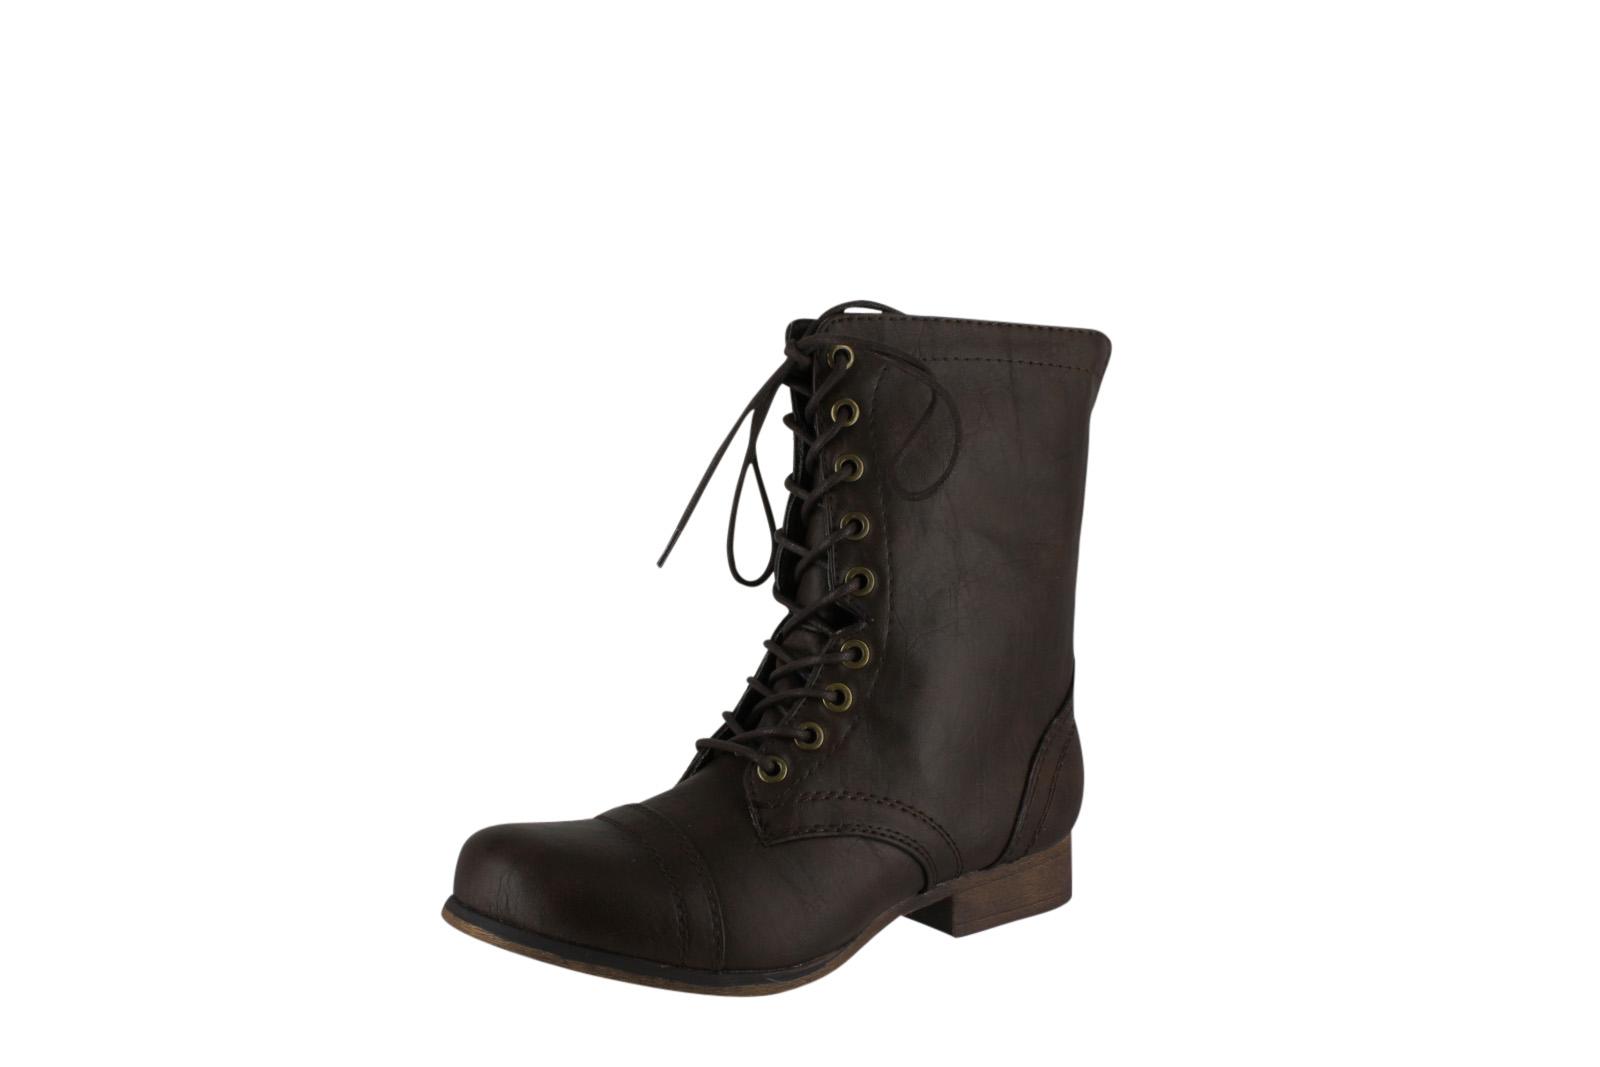 bf59b149fa1 Madden Girl Women s Gavinn Boot - ShoeCenter.com